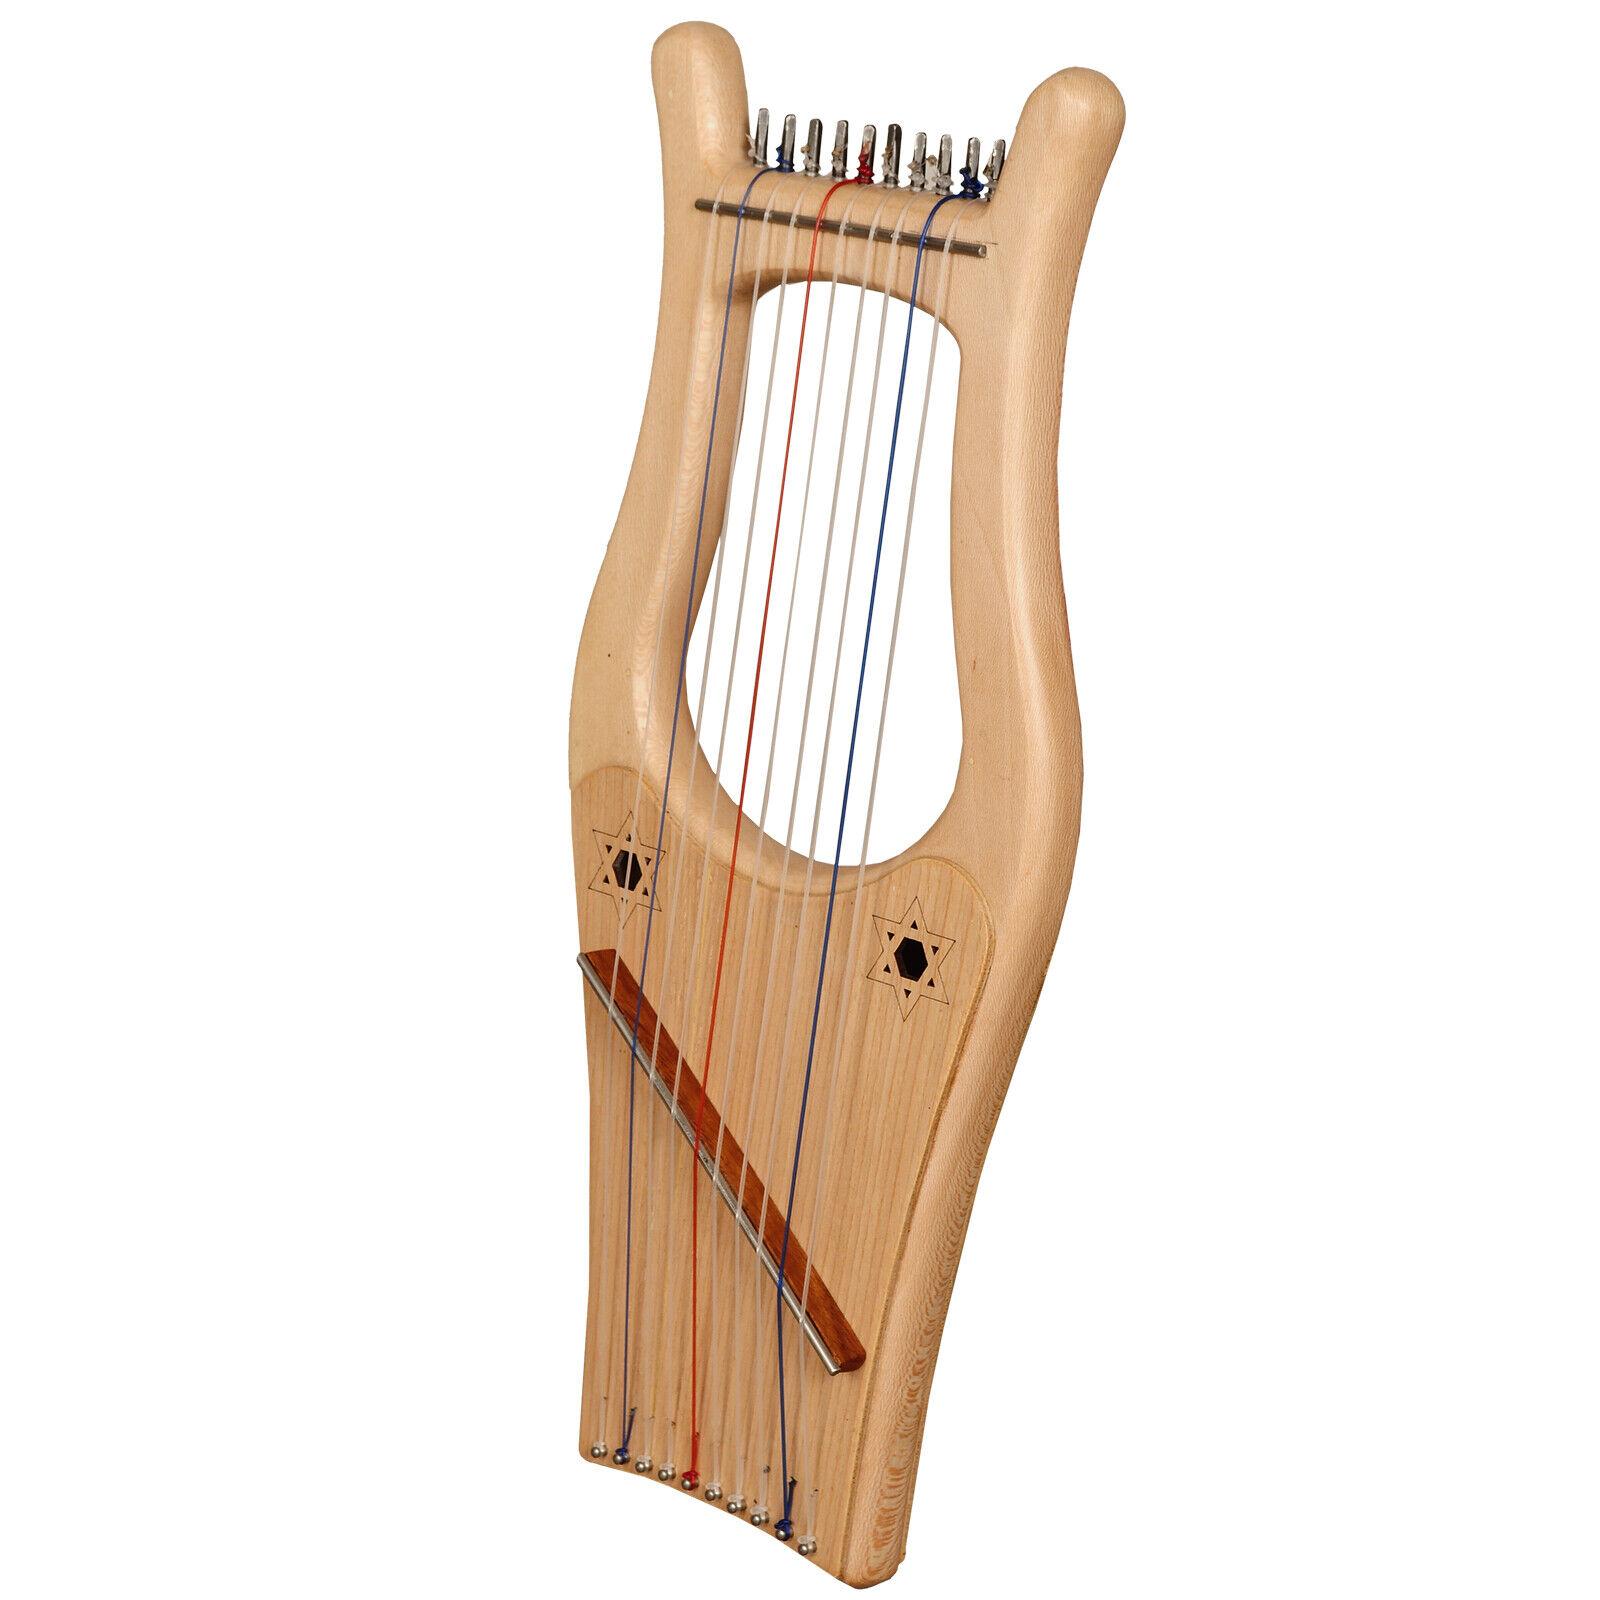 Muzikkon Mini Kinnor Harp, 10 Strings Lacewood, Kinnor Harp, King David Harp